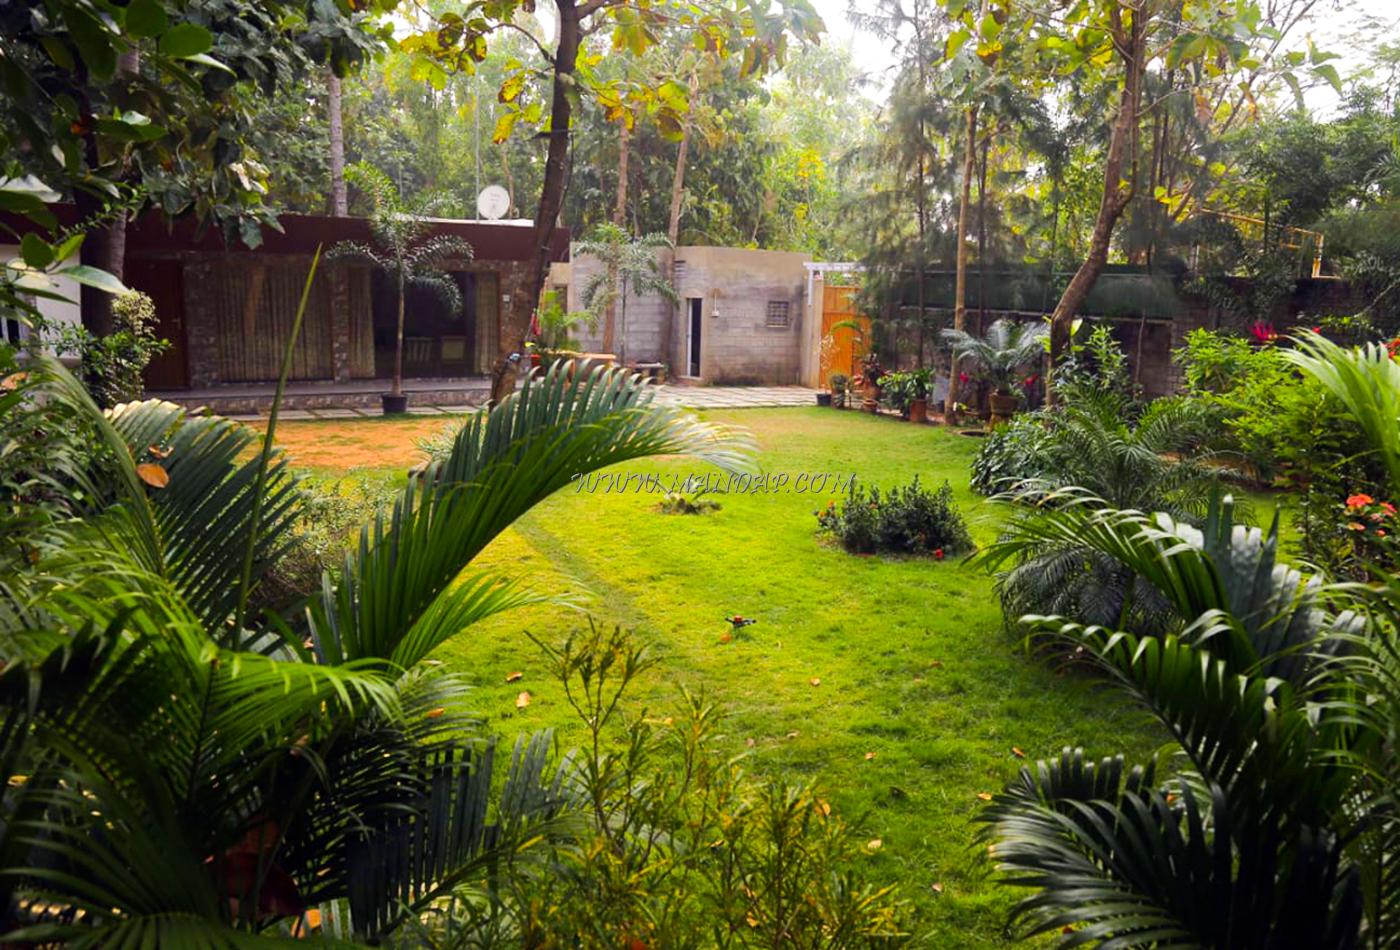 Find More Banquet Halls in Kottakuppam